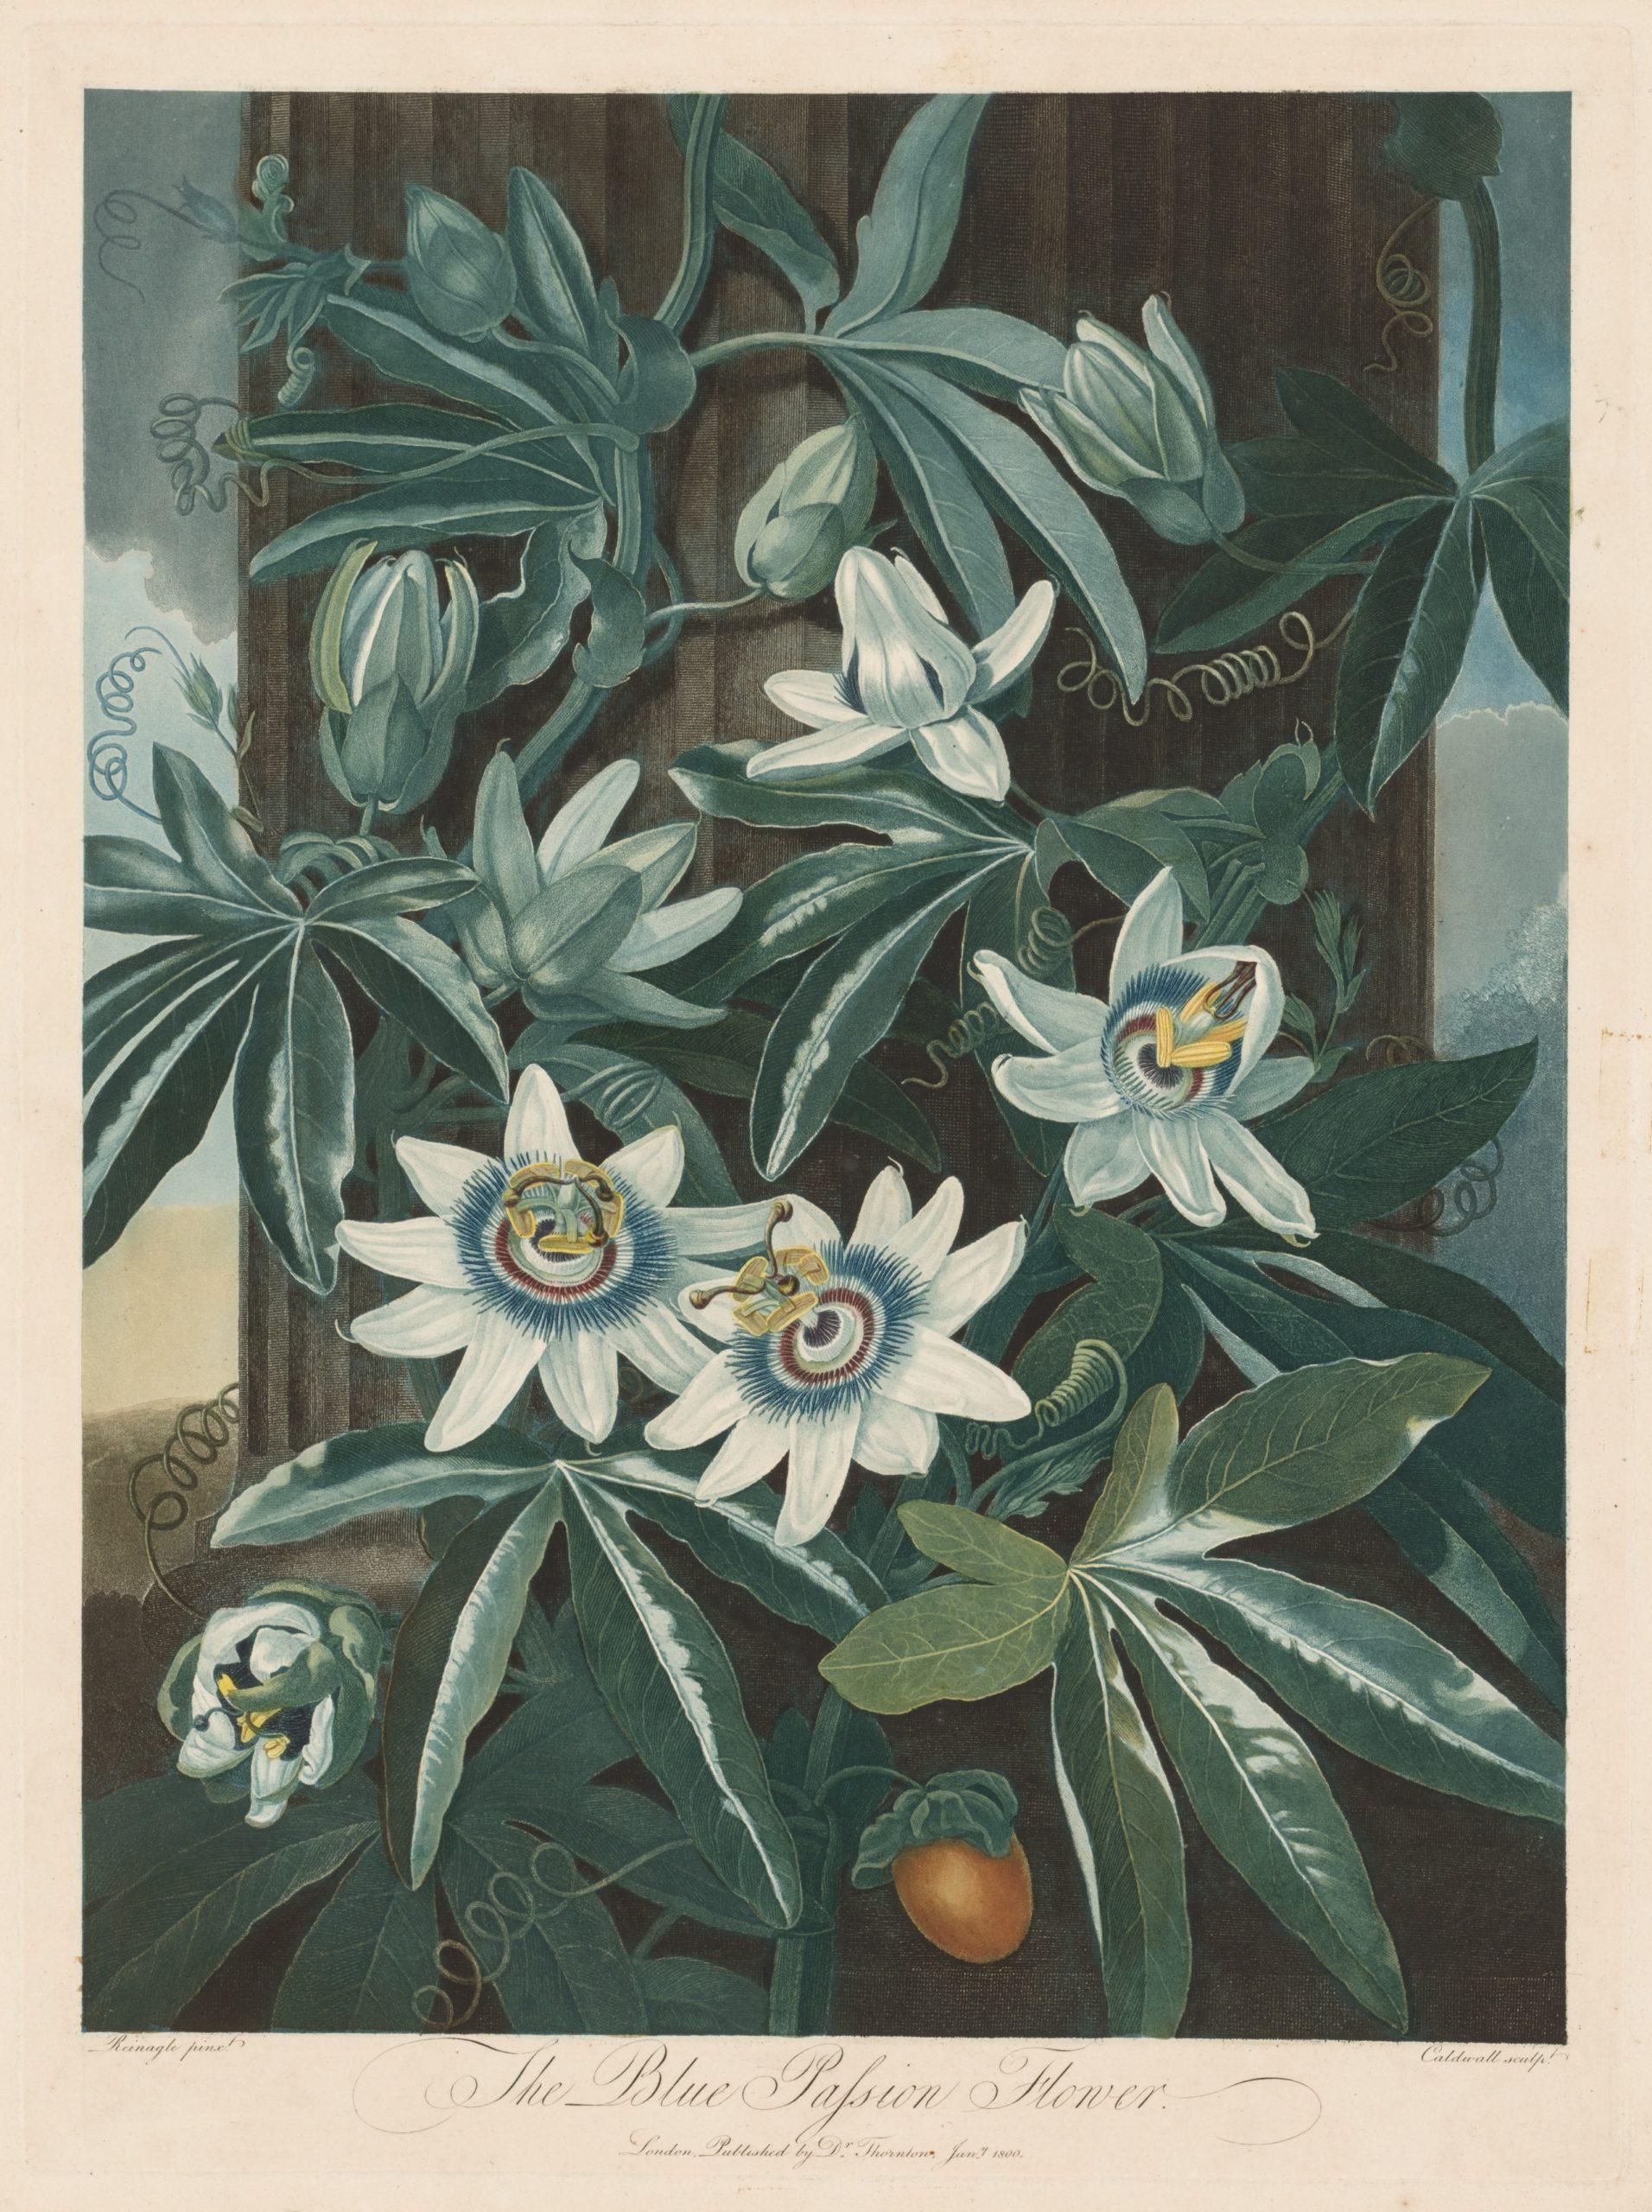 Vintage Botanical Prints - 49 in a series -  The Blue Passion-flower, 1799-1807. Robert John Thornton